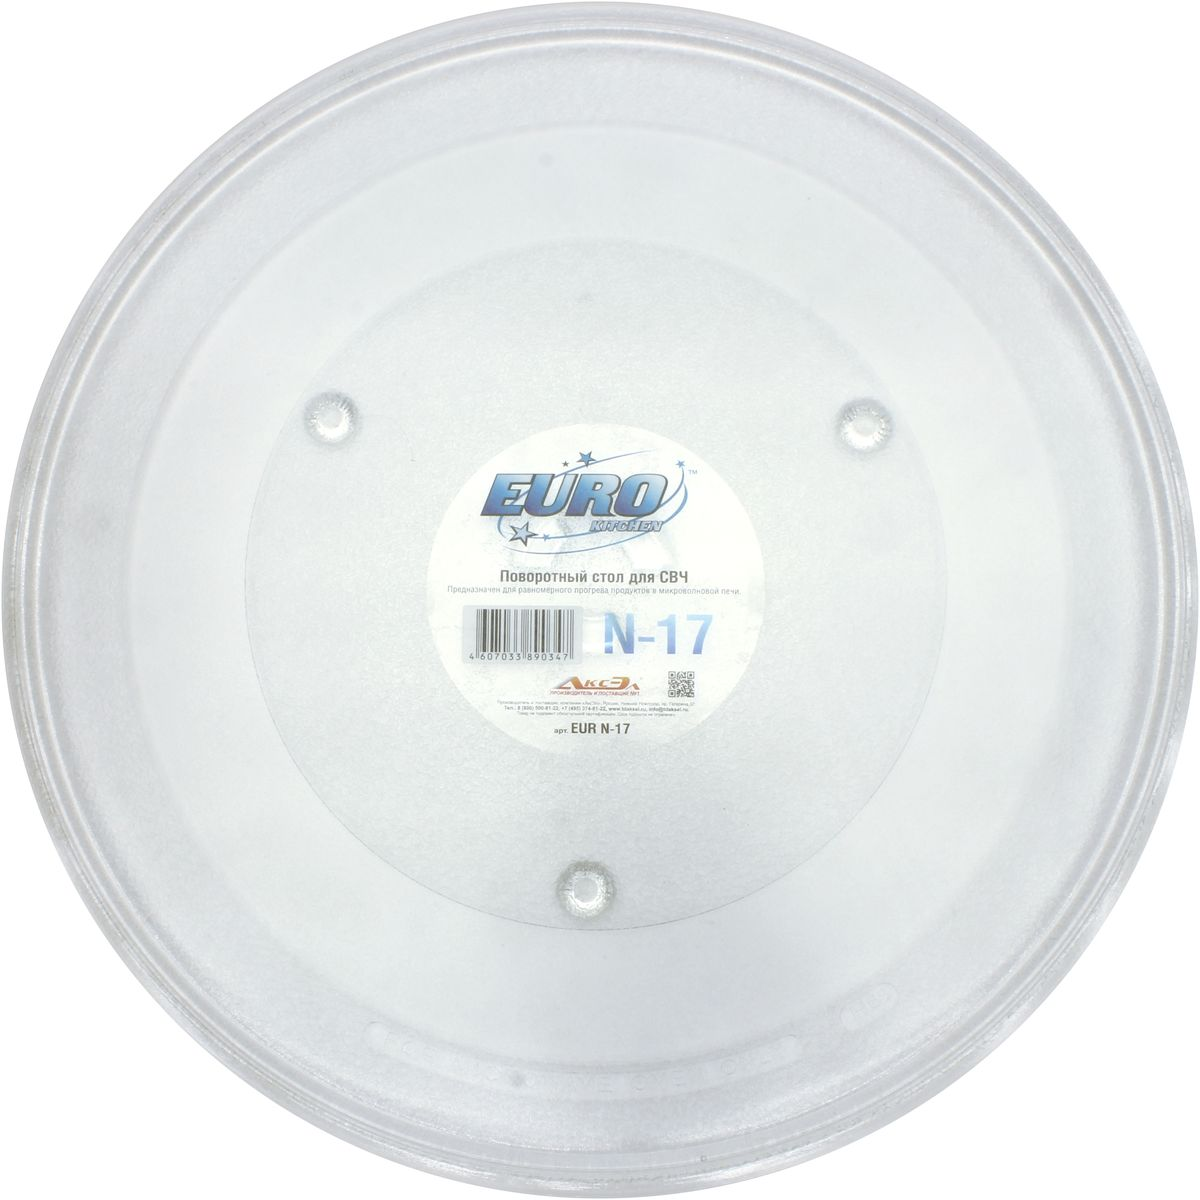 Euro Kitchen N-17 тарелка для СВЧN-17Универсальная тарелка N-17 для микроволновой печи с куплером. Диаметр тарелки 370 мм. Изготовлена из специального жаропрочного стекла. Предназначена для равномерного разогрева продуктов в микроволновой печи.Подходит для брендов:Aeg, Airhot, Amica, Ardo, Ariston, Asko, Atlanta, Aurora, Ava, Barazza, Bauknecht, Bbk, Beko, Bomann, Bork, Bosch, Brandt, Candy, Cata, Centek, Clatronic, Daewoo, De dietrich, Delfa, Electrolux, Elenberg, Ergo, Erisson, Eurotec, Fagor, Fimar, Foster, Franke, Fulgor, Fusion, Gaggenau, Gastrorag, Goldstar, Gorenje, Hankel, Hansa, Hilton, Horizont, Hurakan, Hyundai, Ilve, Indesit, Kaiser, Kenmore, Kenwood, Korting, Kuppersberg, Kuppersbusch, Kamark, Keran, Lg, Liberton, Liberty, Maxwell, Menumaster, Midea, Miele, Moulinex, Mystery, Neff, Oursson, Panasonic, Proficook, Rainford, Redmond, Rolsen, Samsung, Saturn, Scarlett, Sencor, Sharp, Siemens, Simfer, Sinbo, Sirman, Smeg, Supra, Teka, Thomson, Toshiba, V-zug, Vasko, Vimar, Vitek, Vr, Weissgauff, West, Whirlpool, Zanussi, Zelmer, Zigmund&Shtain, Витязь, Рубин.